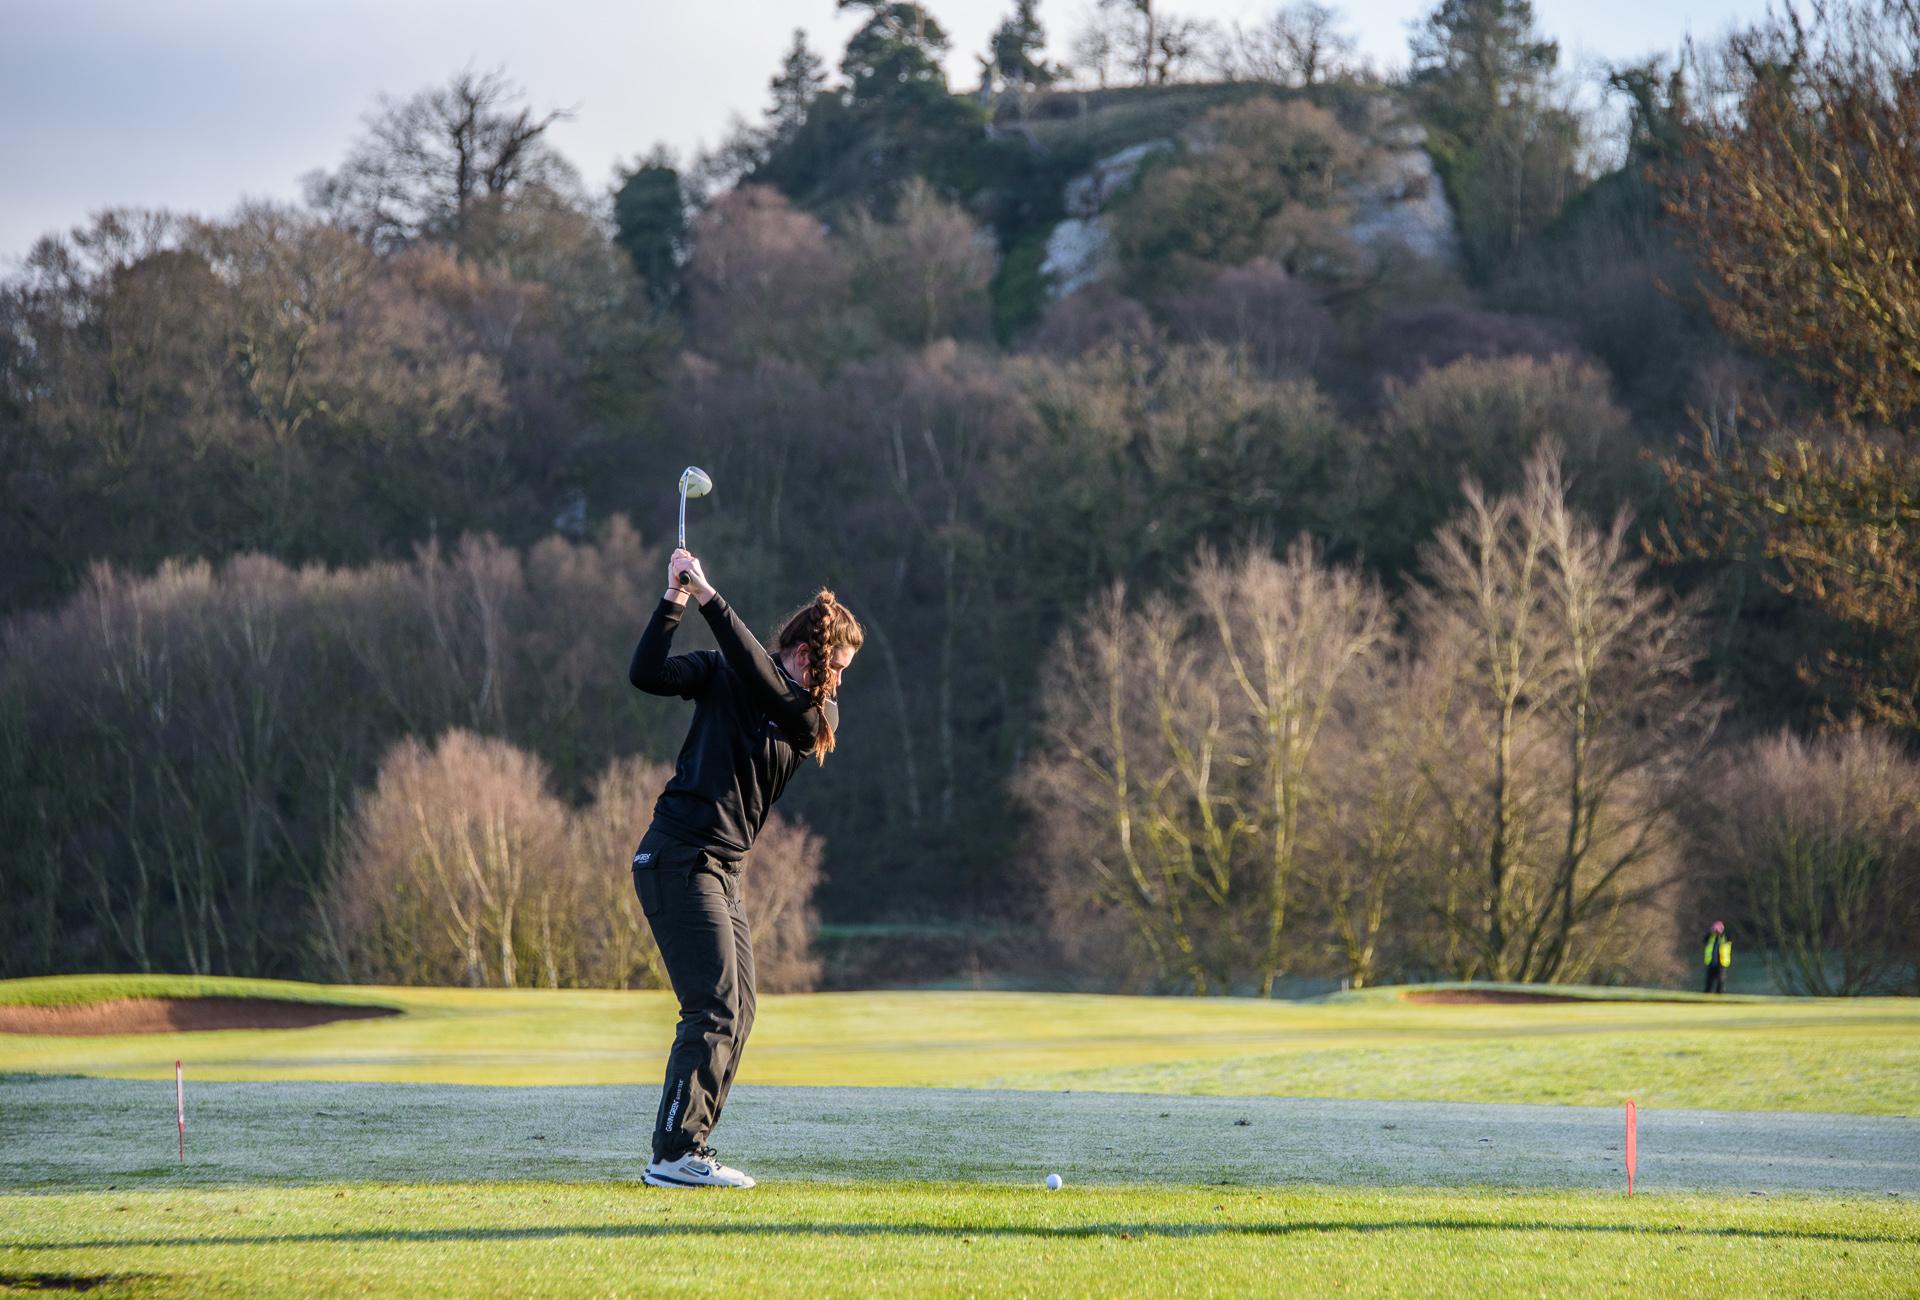 Kevindiss.com golf course photography Hawkstone Park golf course-2234-2.jpg